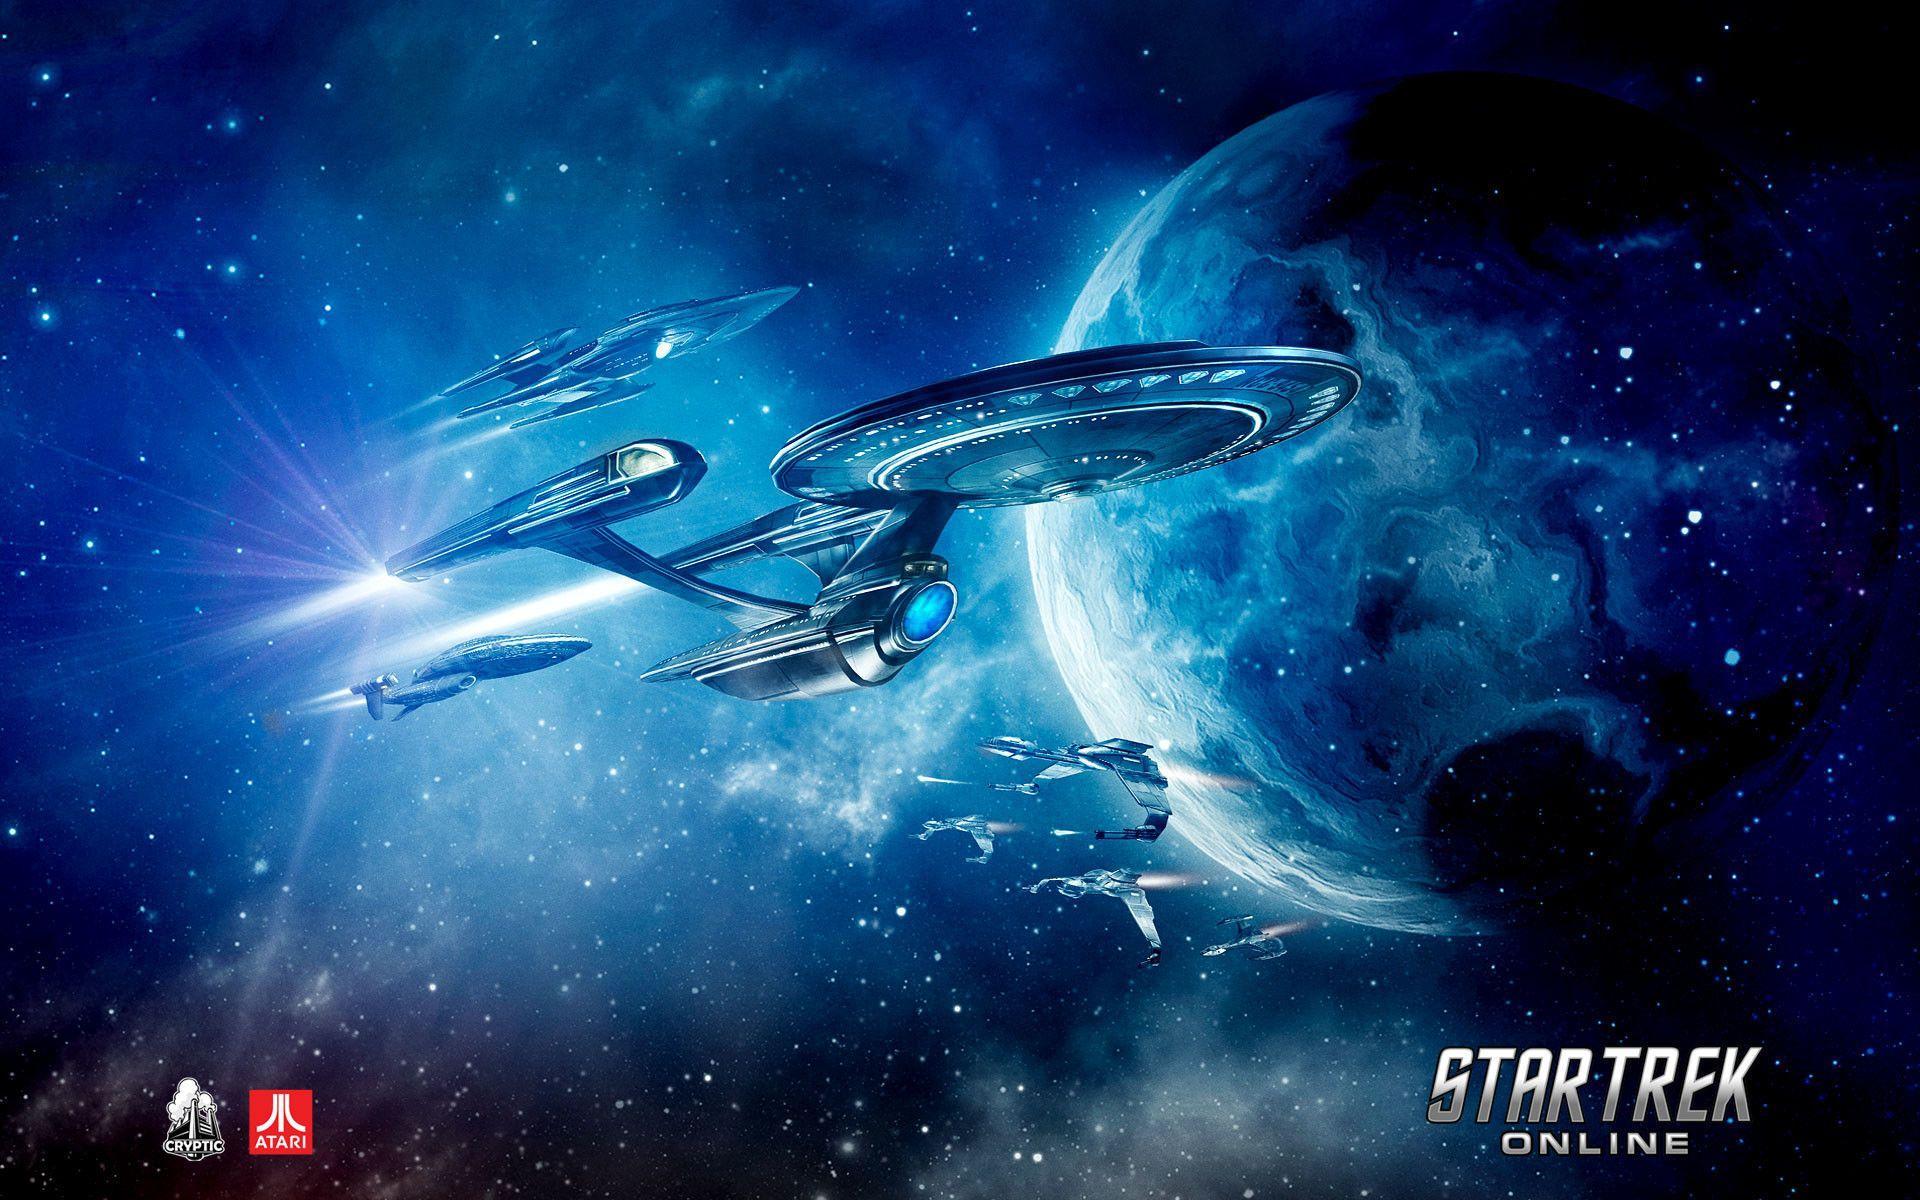 Star Trek Enterprise Iphone Wallpapers Top Free Star Trek